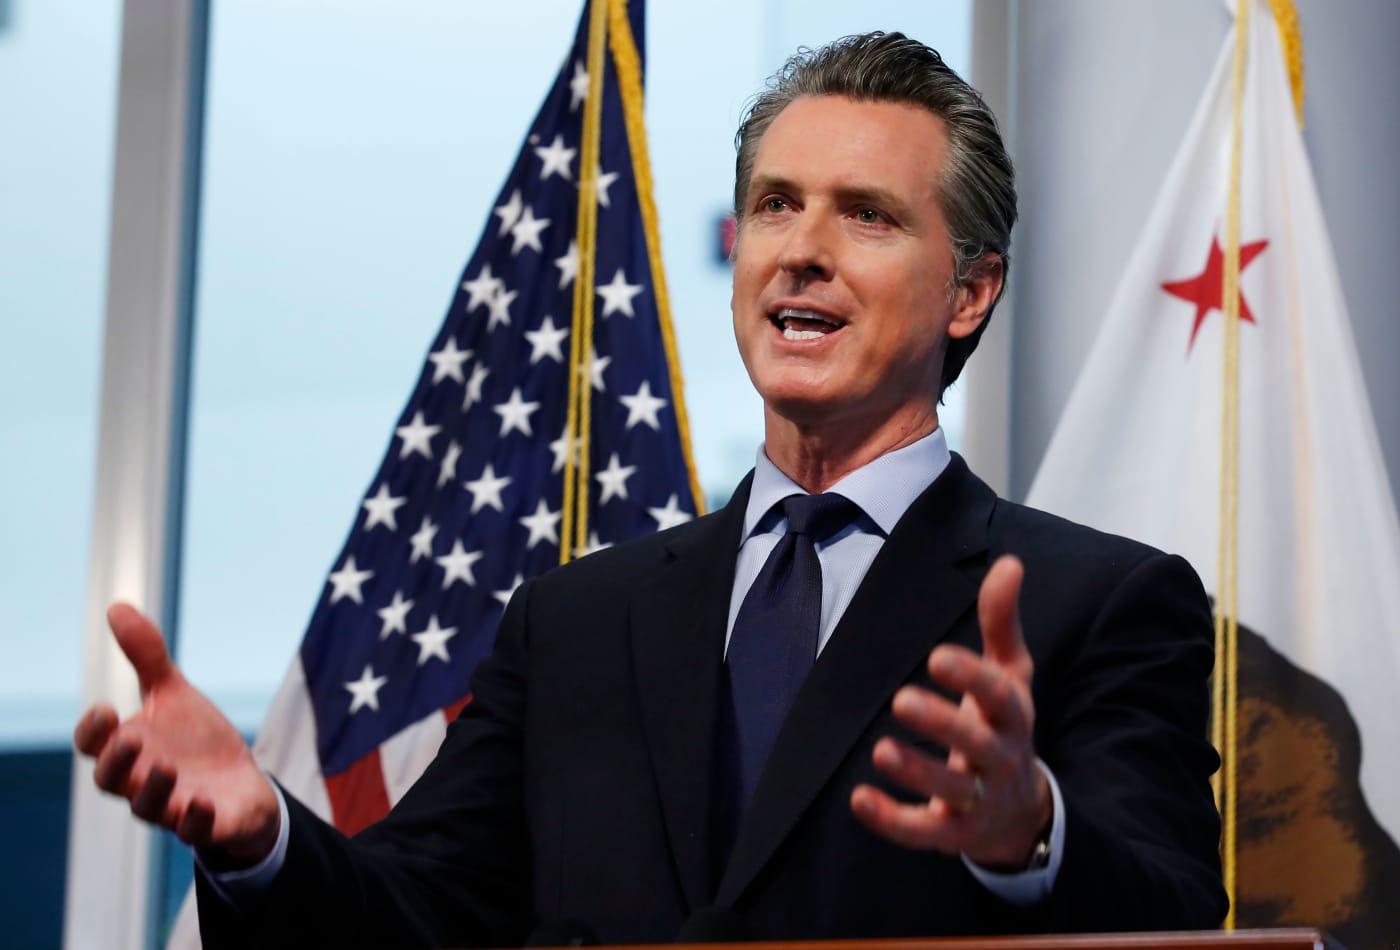 Gov. Newsom announces more benefits for unemployed Californians amid coronavirus pandemic